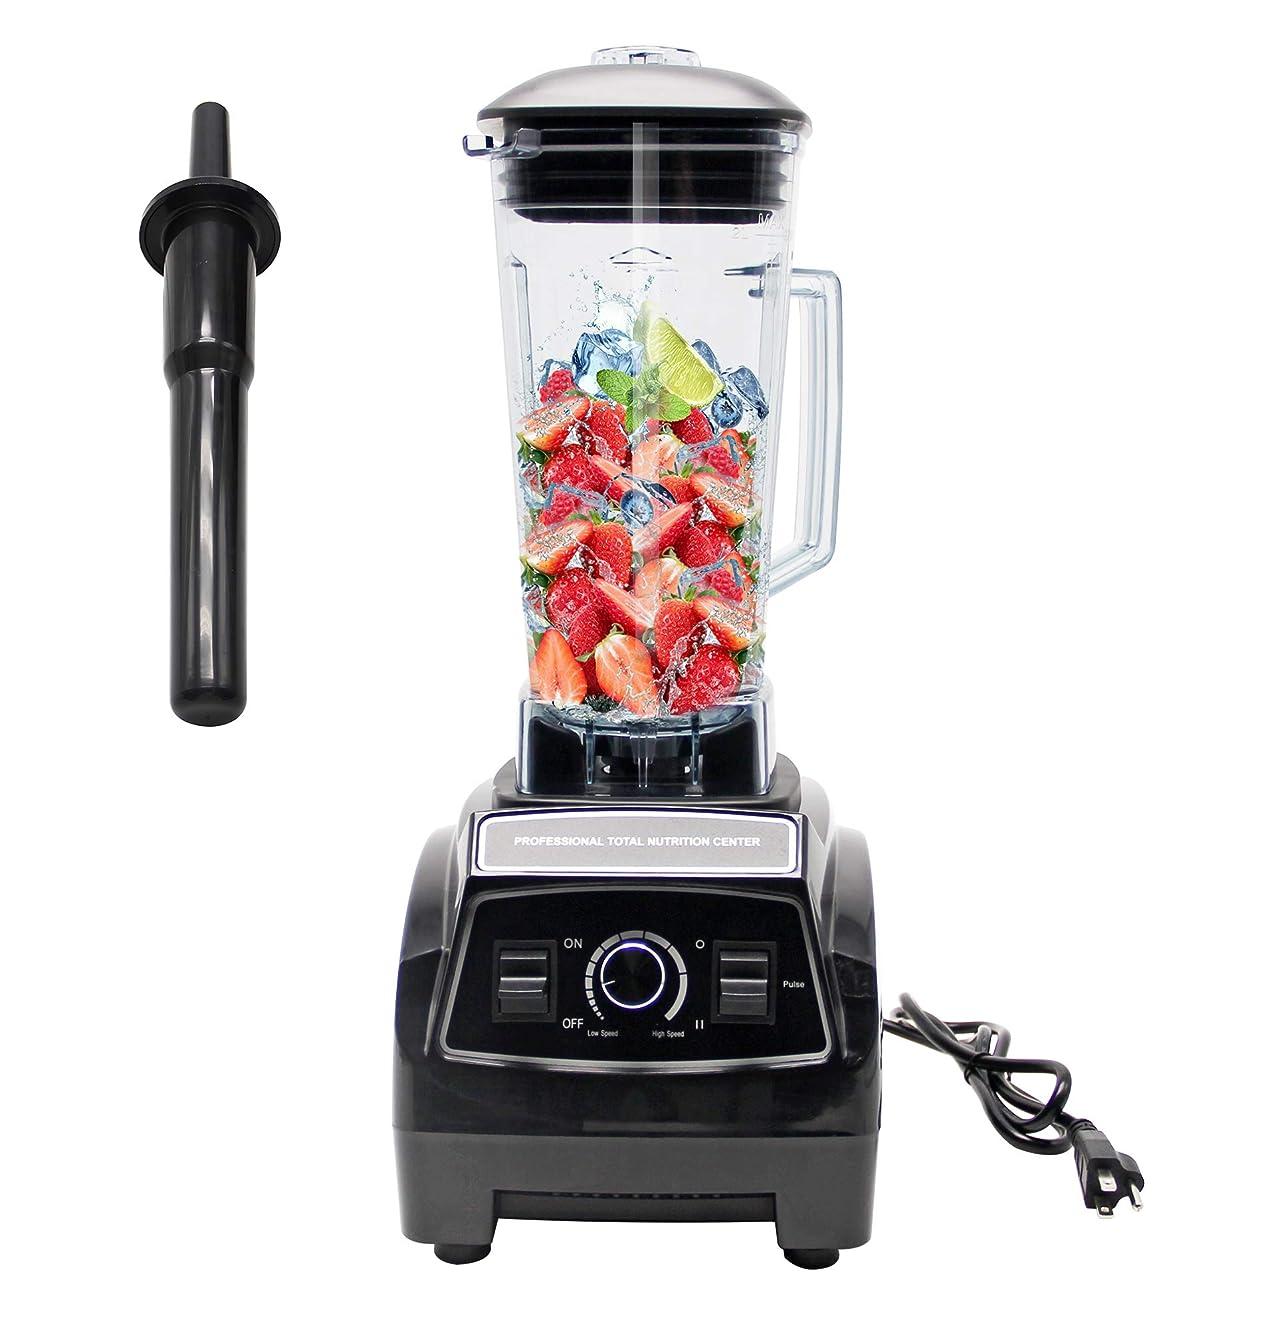 Huanyu ブレンダー 多機能ミキサー 2200W 2L ジューサー 野菜 果物 スムージー ミックス つぶす まぜる 家庭用 業務用 (2200W)